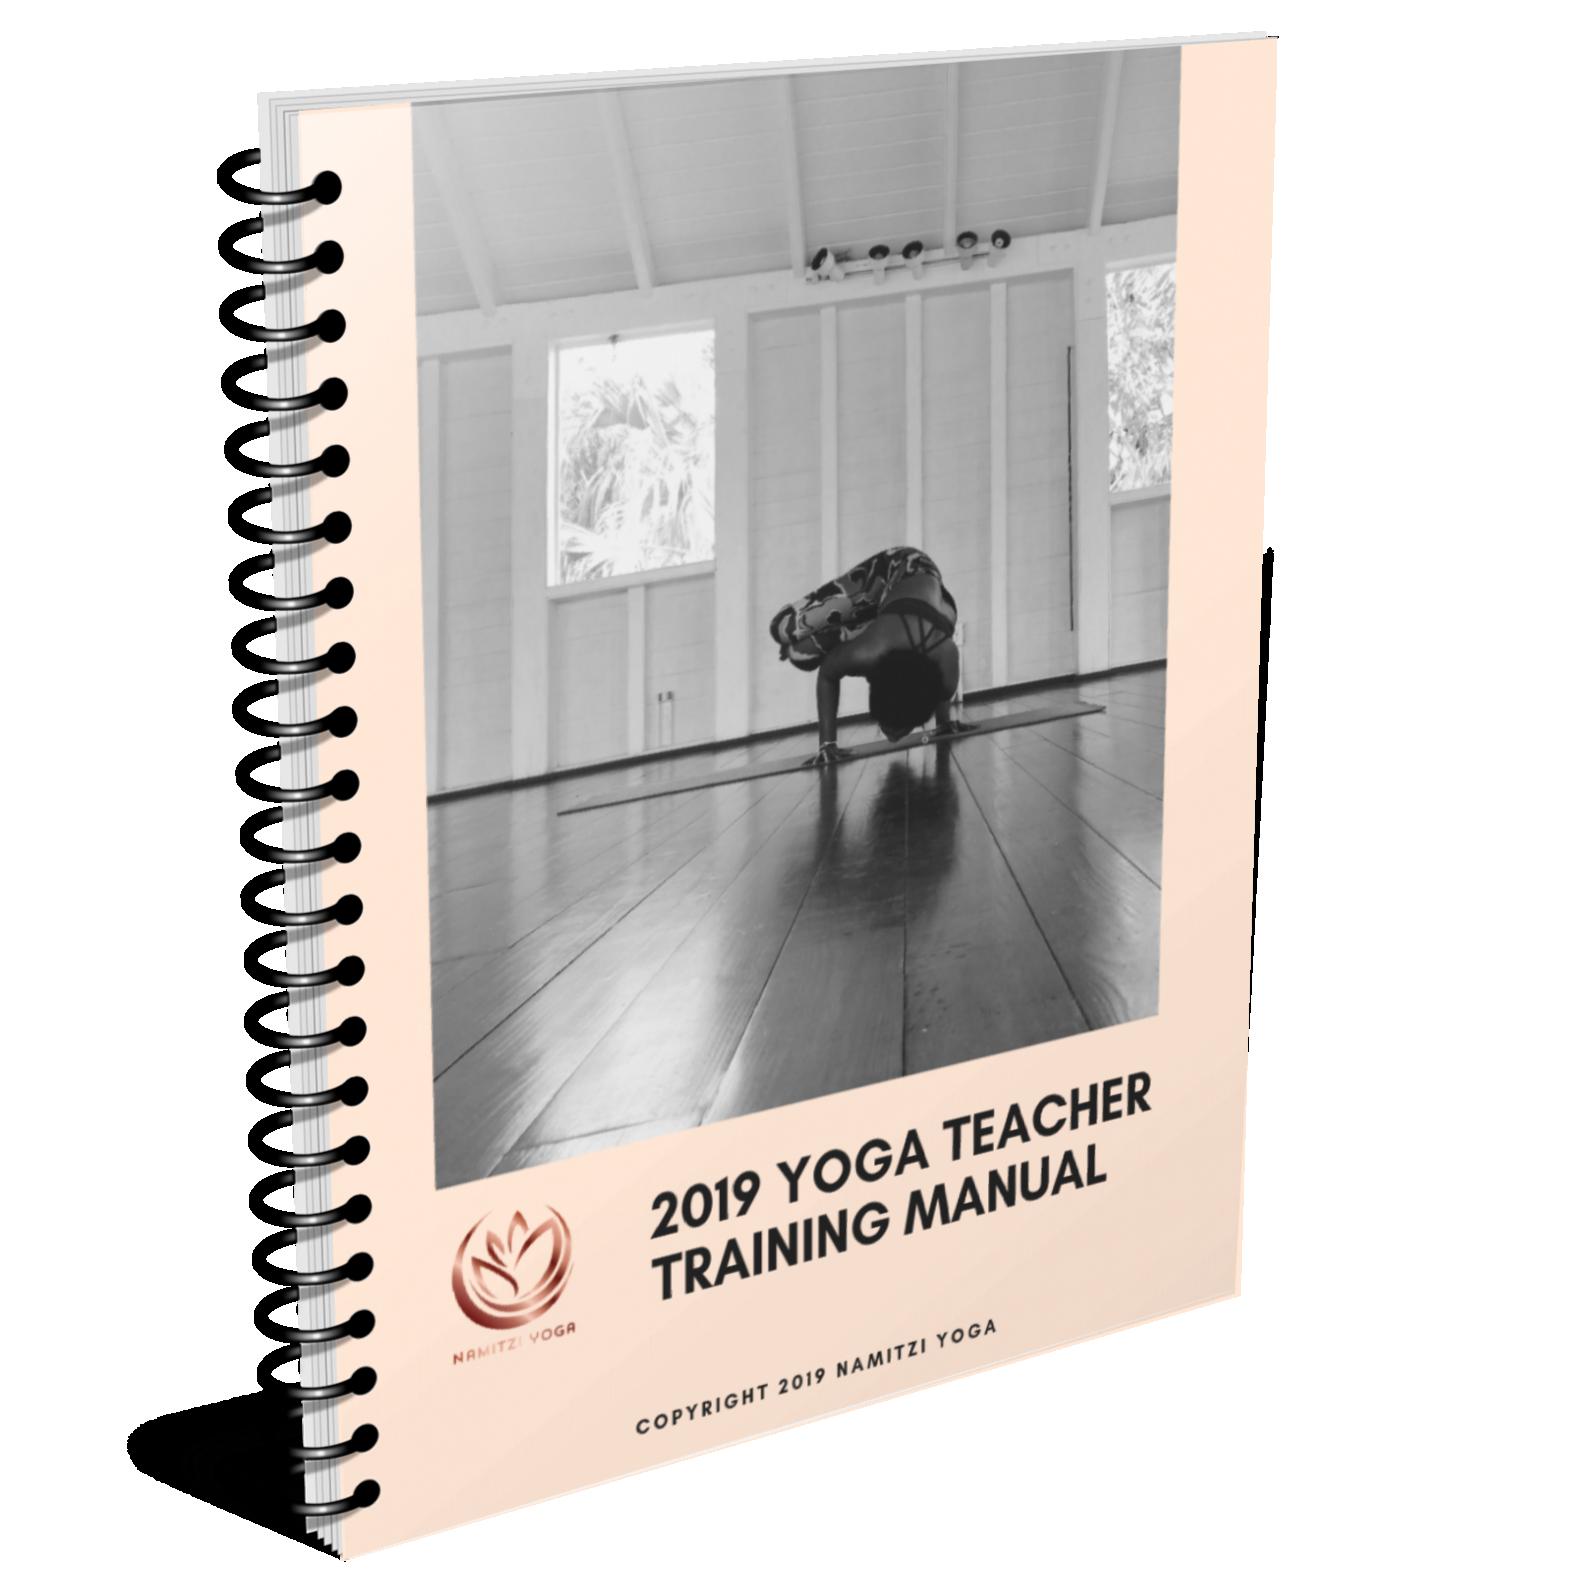 Yoga Studio Graphic Design Marketing.png